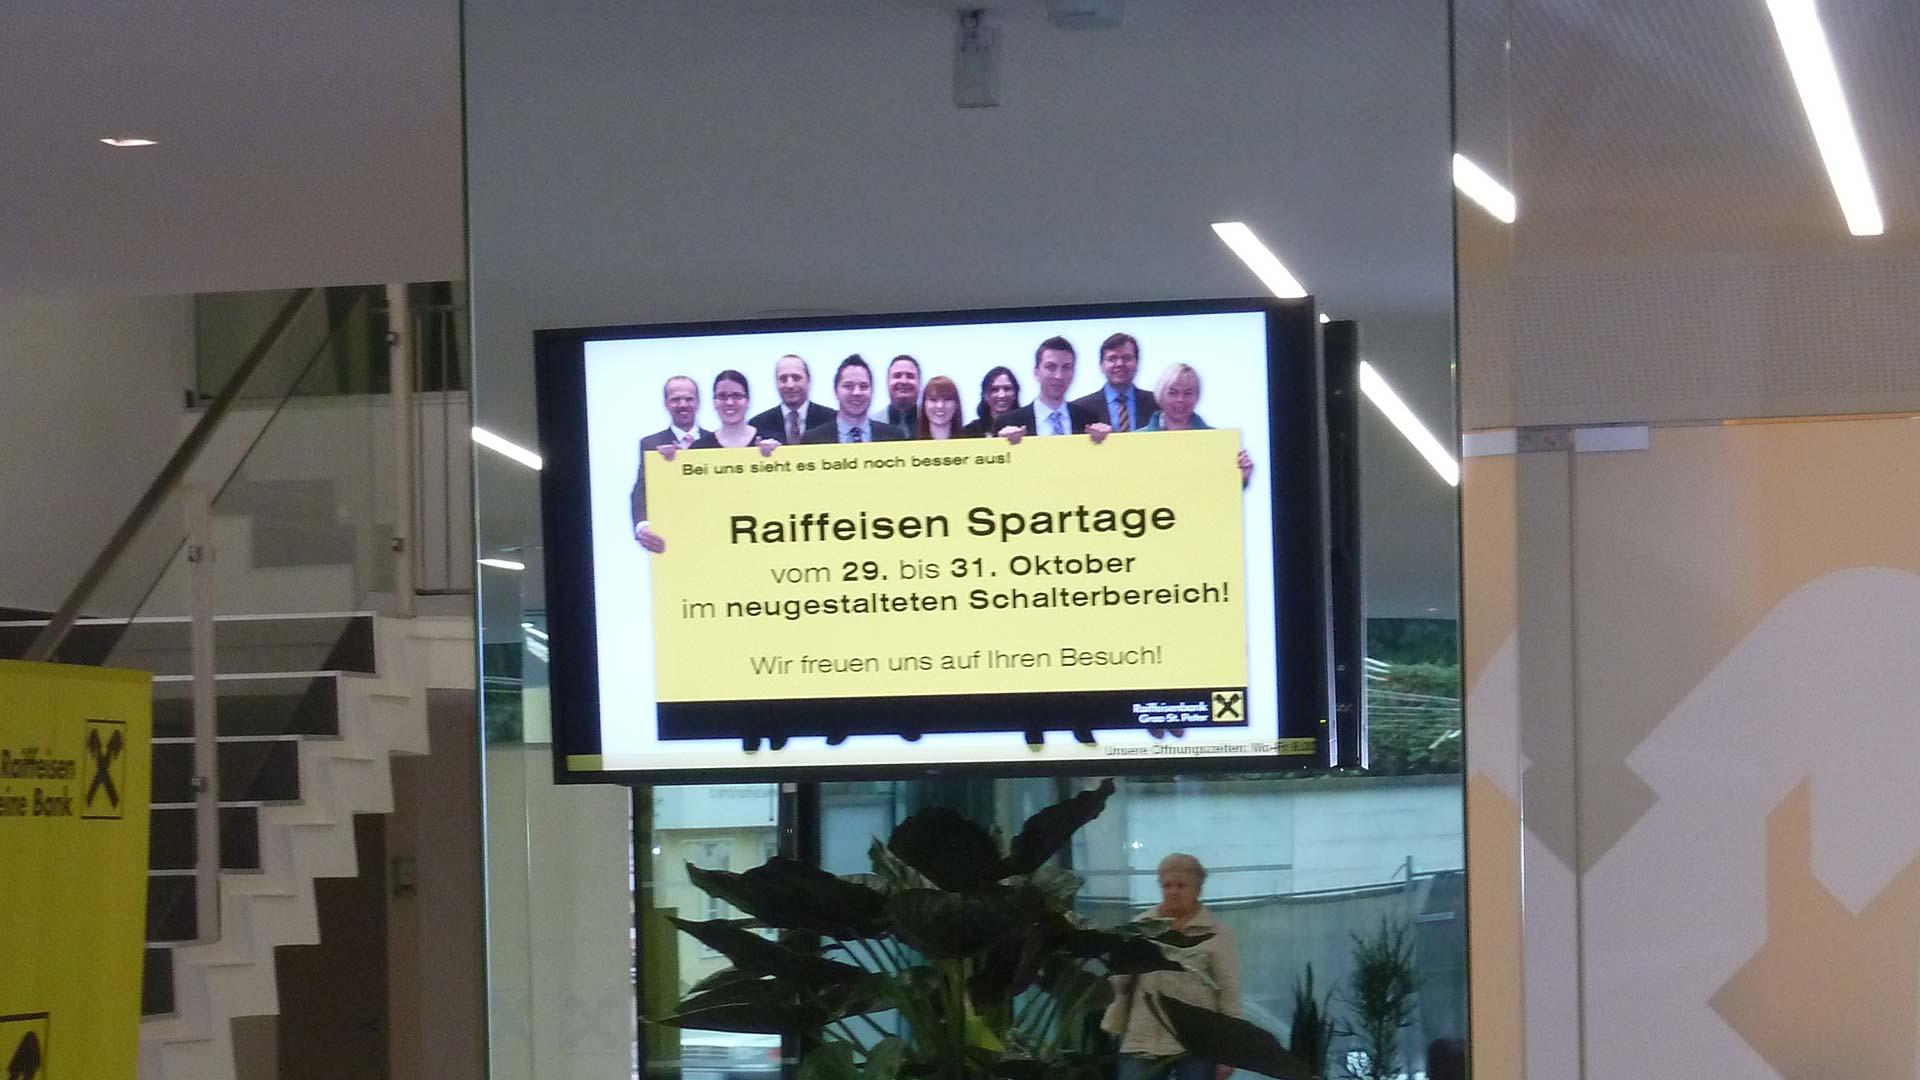 Raiffeisen Graz St. Peter Indoor Digital Signage